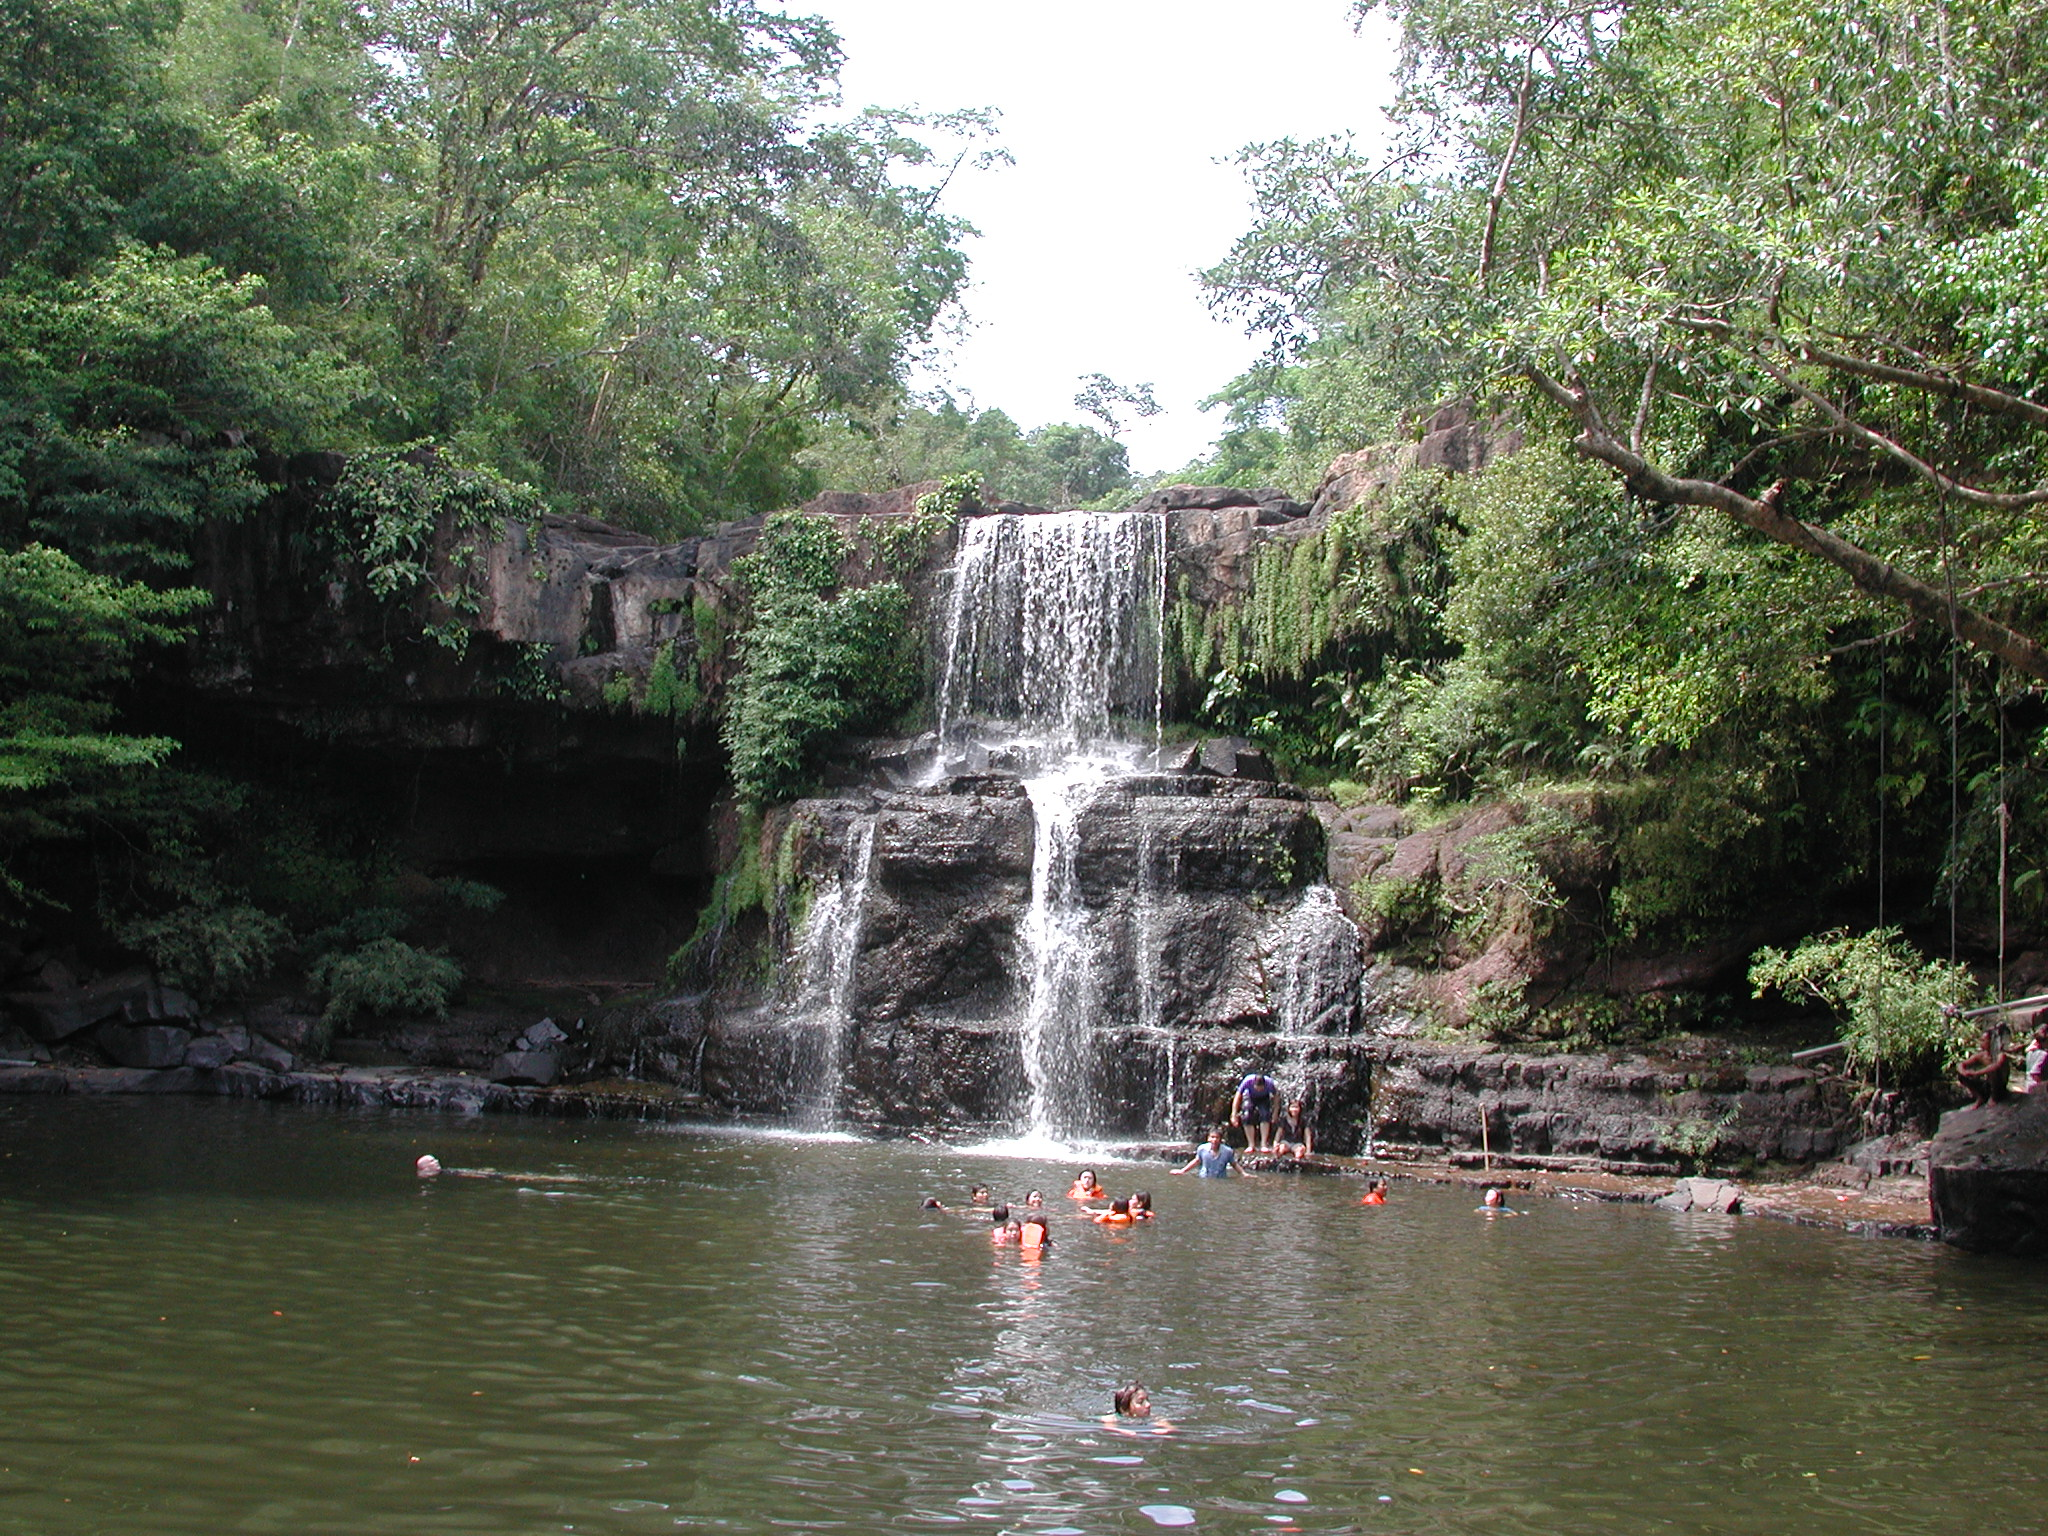 File:Waterfalls of Ko Kut Island.jpg - Wikimedia Commons